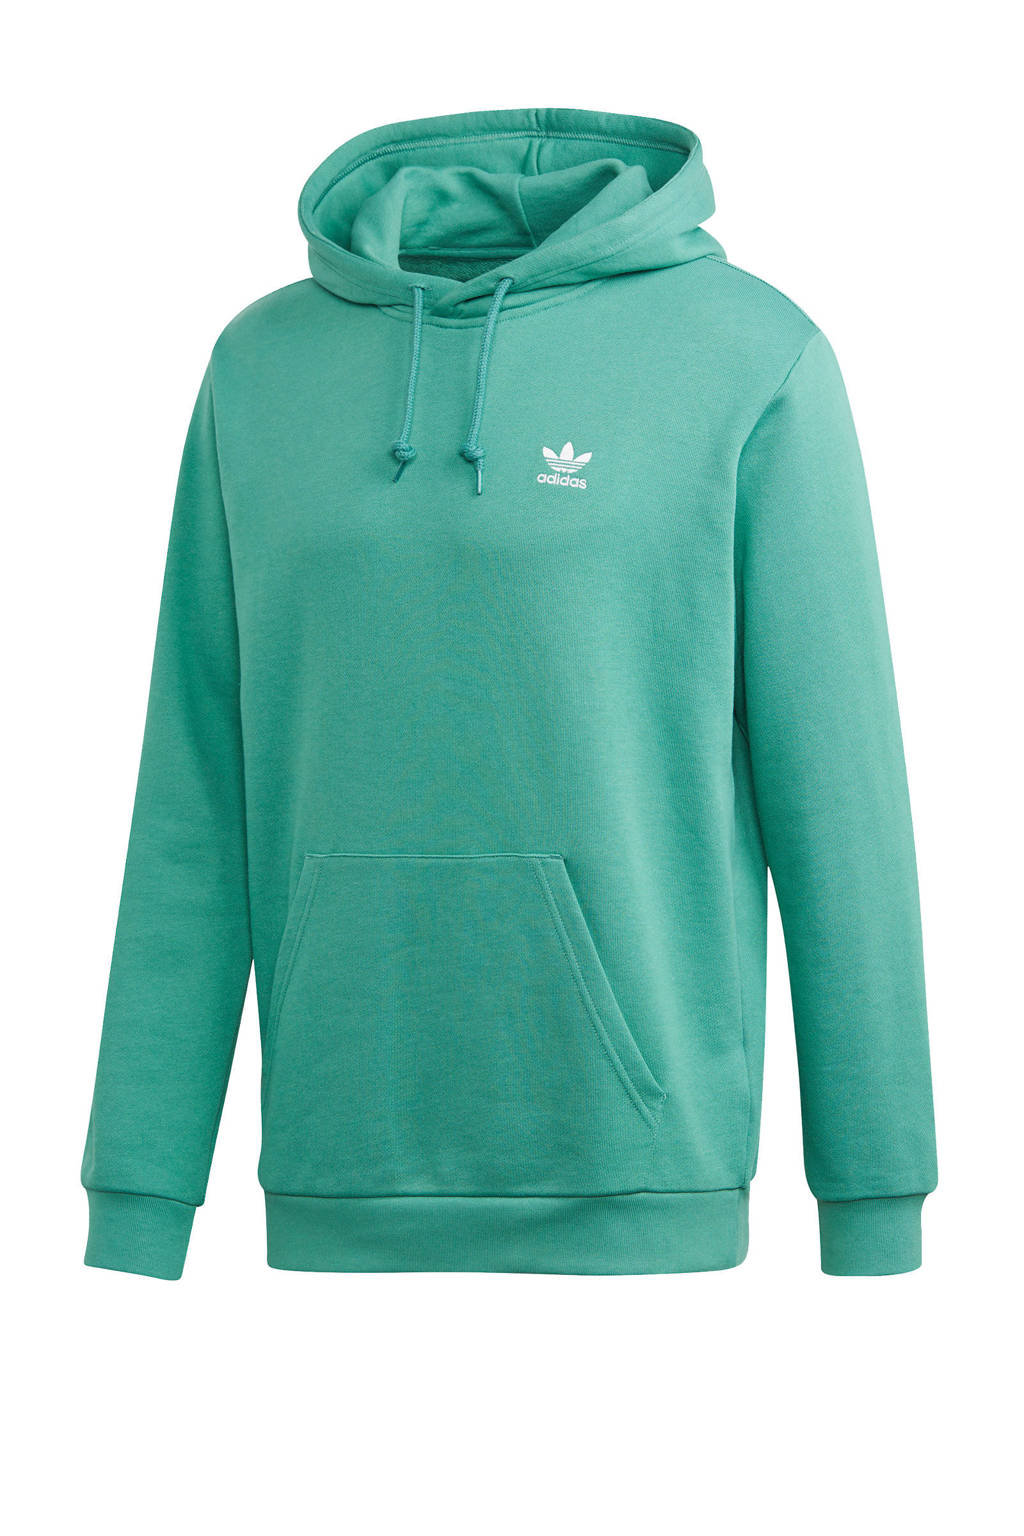 adidas Originals Adicolor hoodie groen, Groen